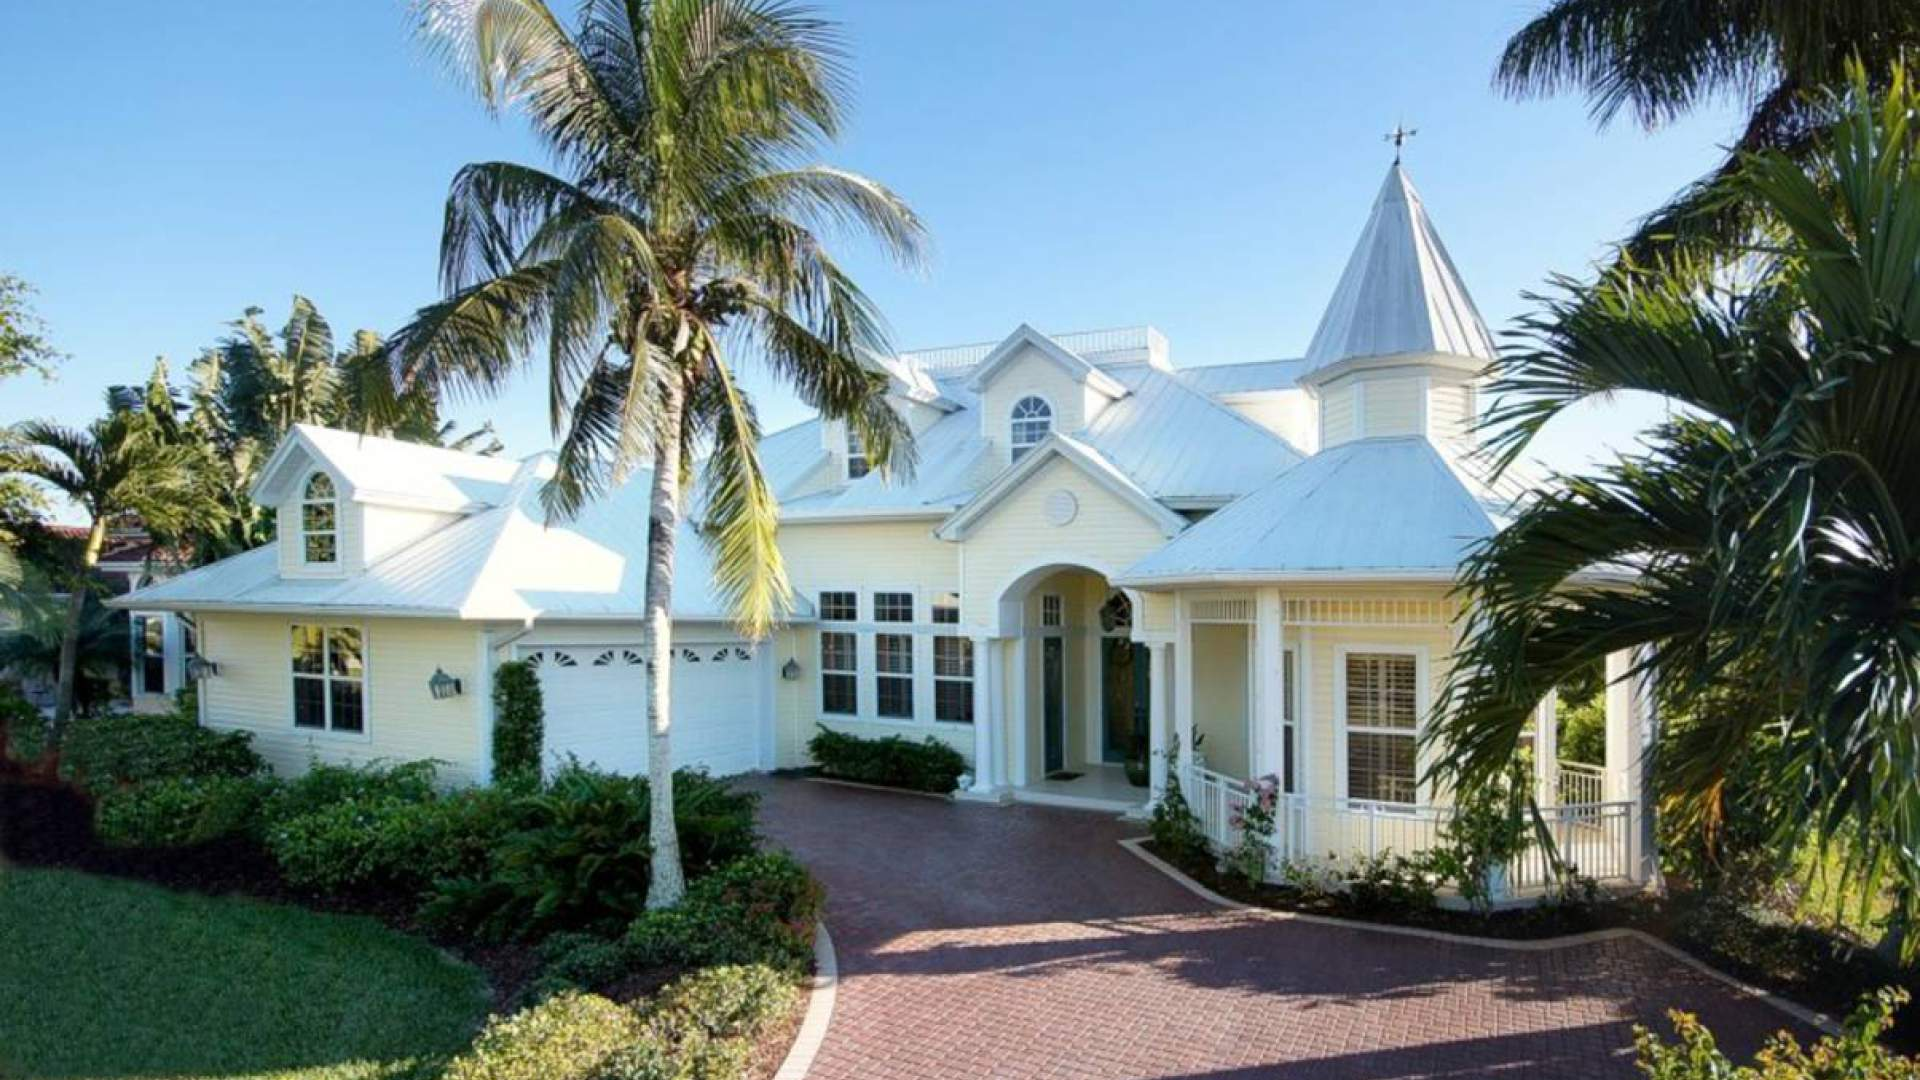 Urlaub in tropischer Umgebung: Villa Siesta Key in Cape Coral